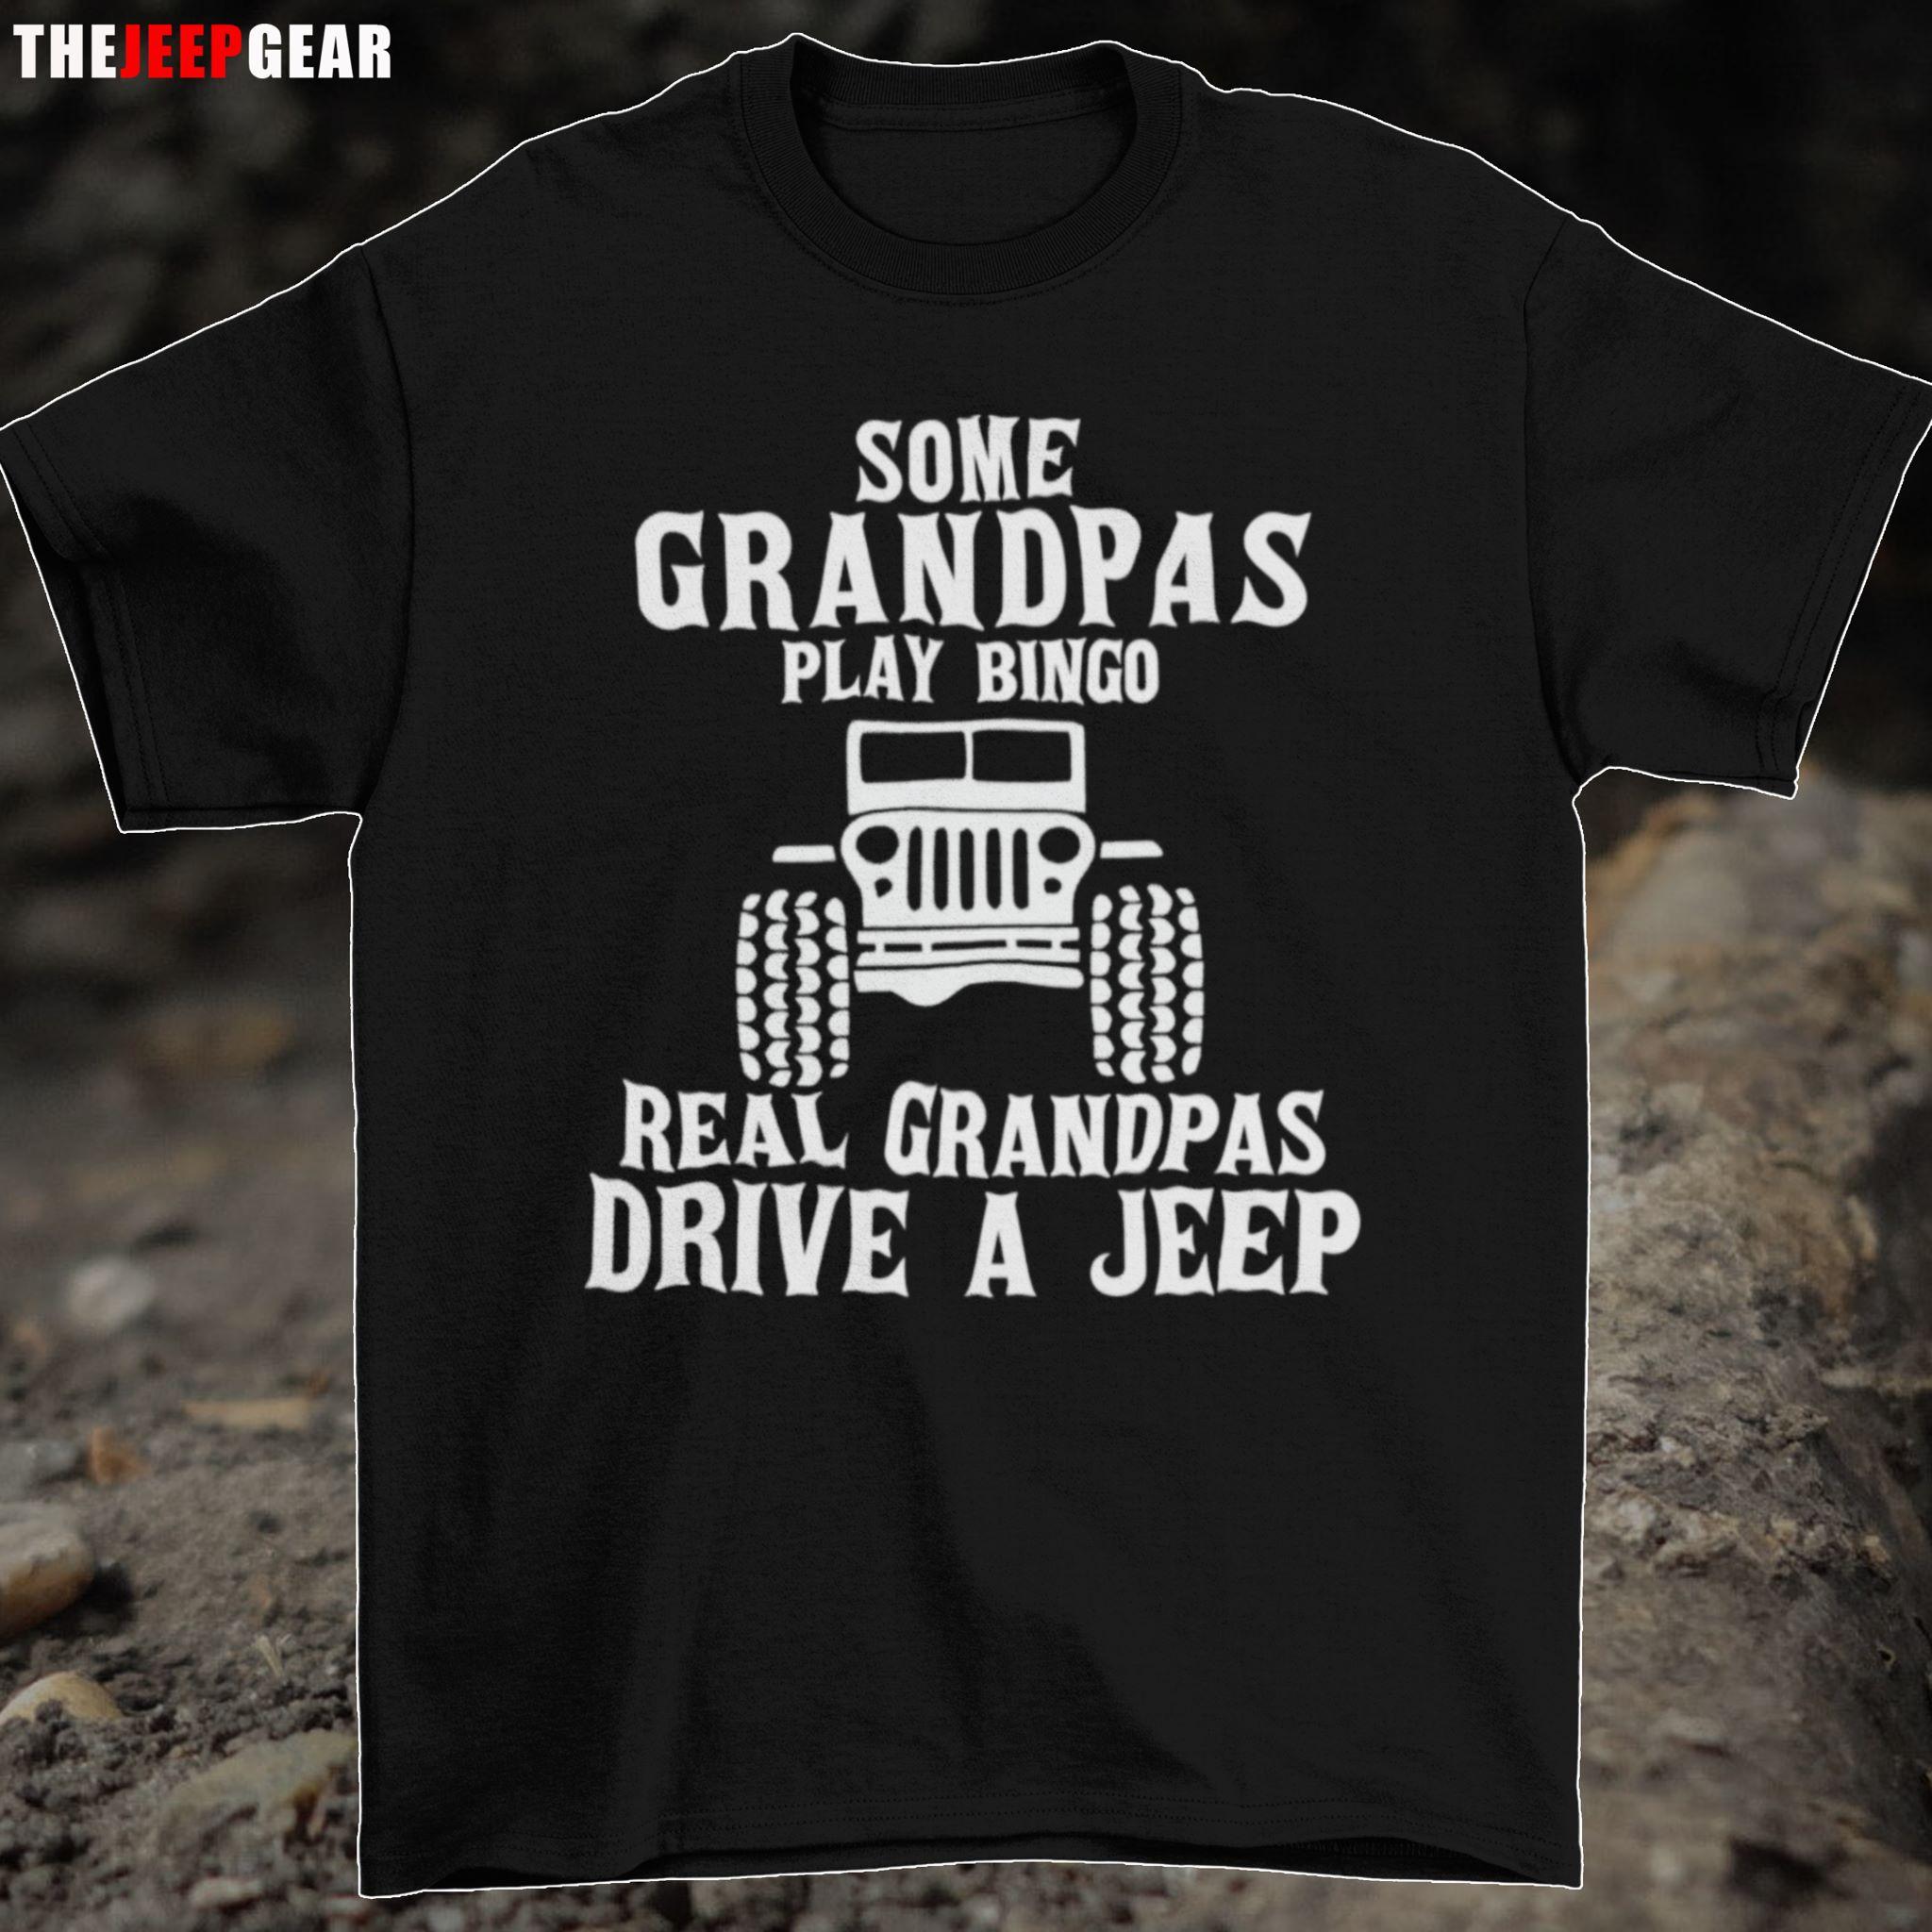 Some grandpas play bingo real grandpa's drive a jeep shirt